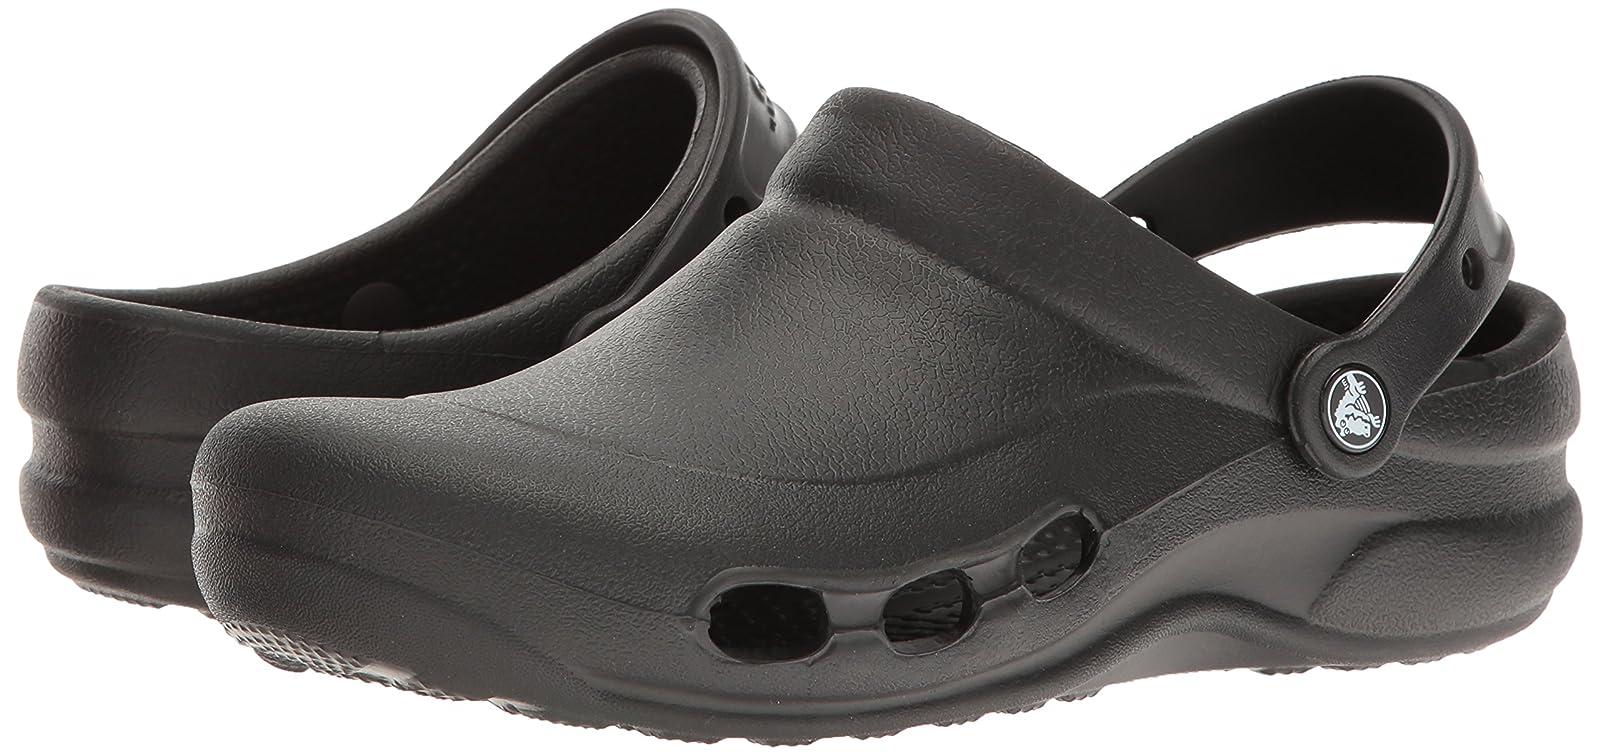 Crocs Unisex Specialist Vent Clog Black 11 10074M Black - 6